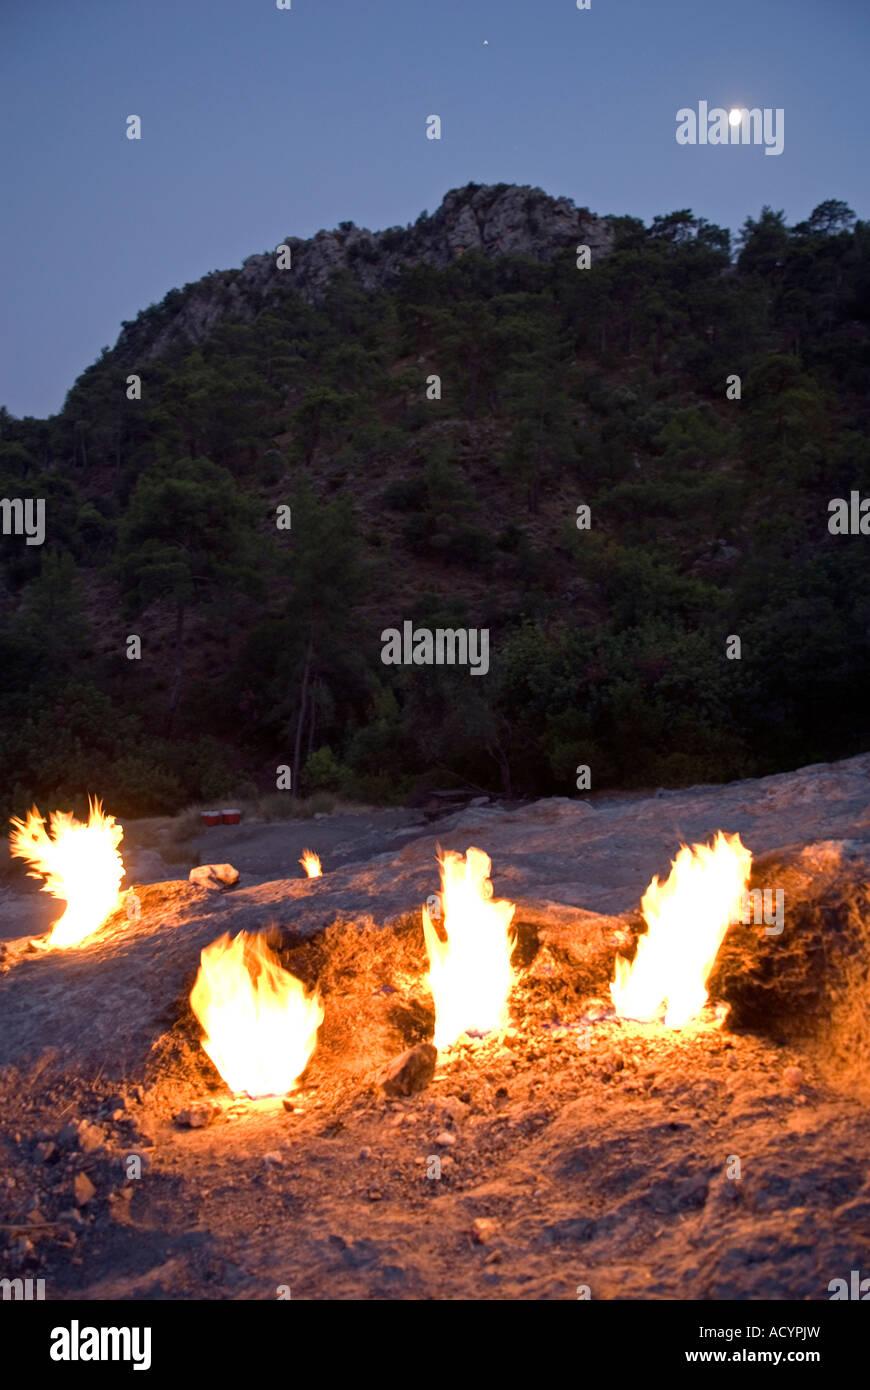 Ethernal flammes de chimère d'Olympos, Cirali la Turquie. Photo Stock